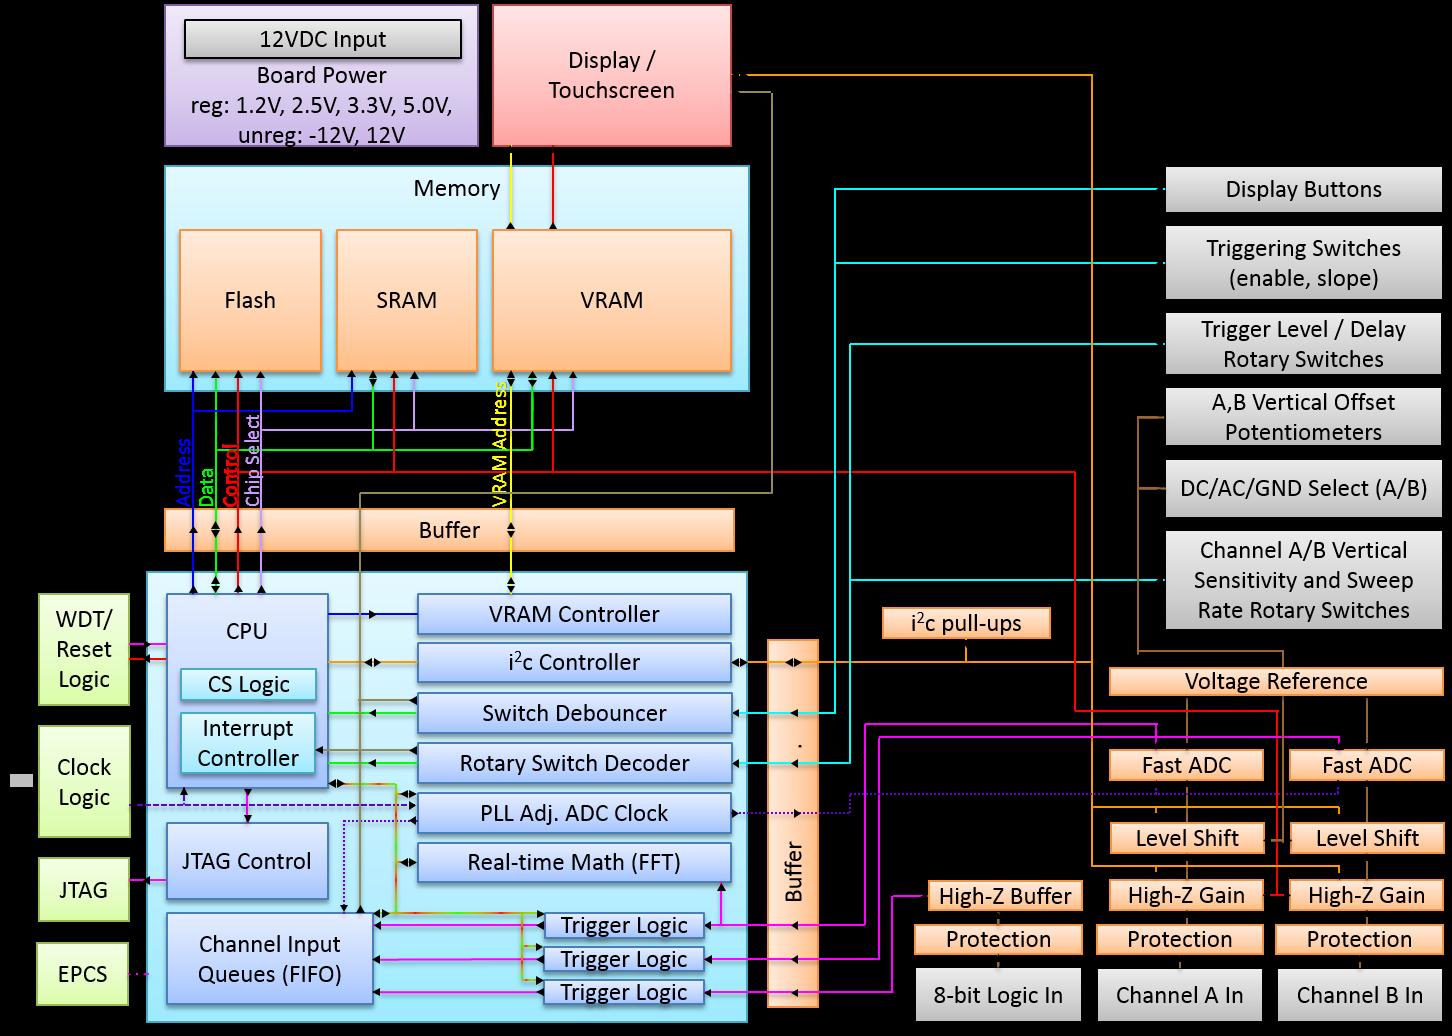 SOTA_osci_FPGA · Wiki · openlab / openlab_wiki · GitLab